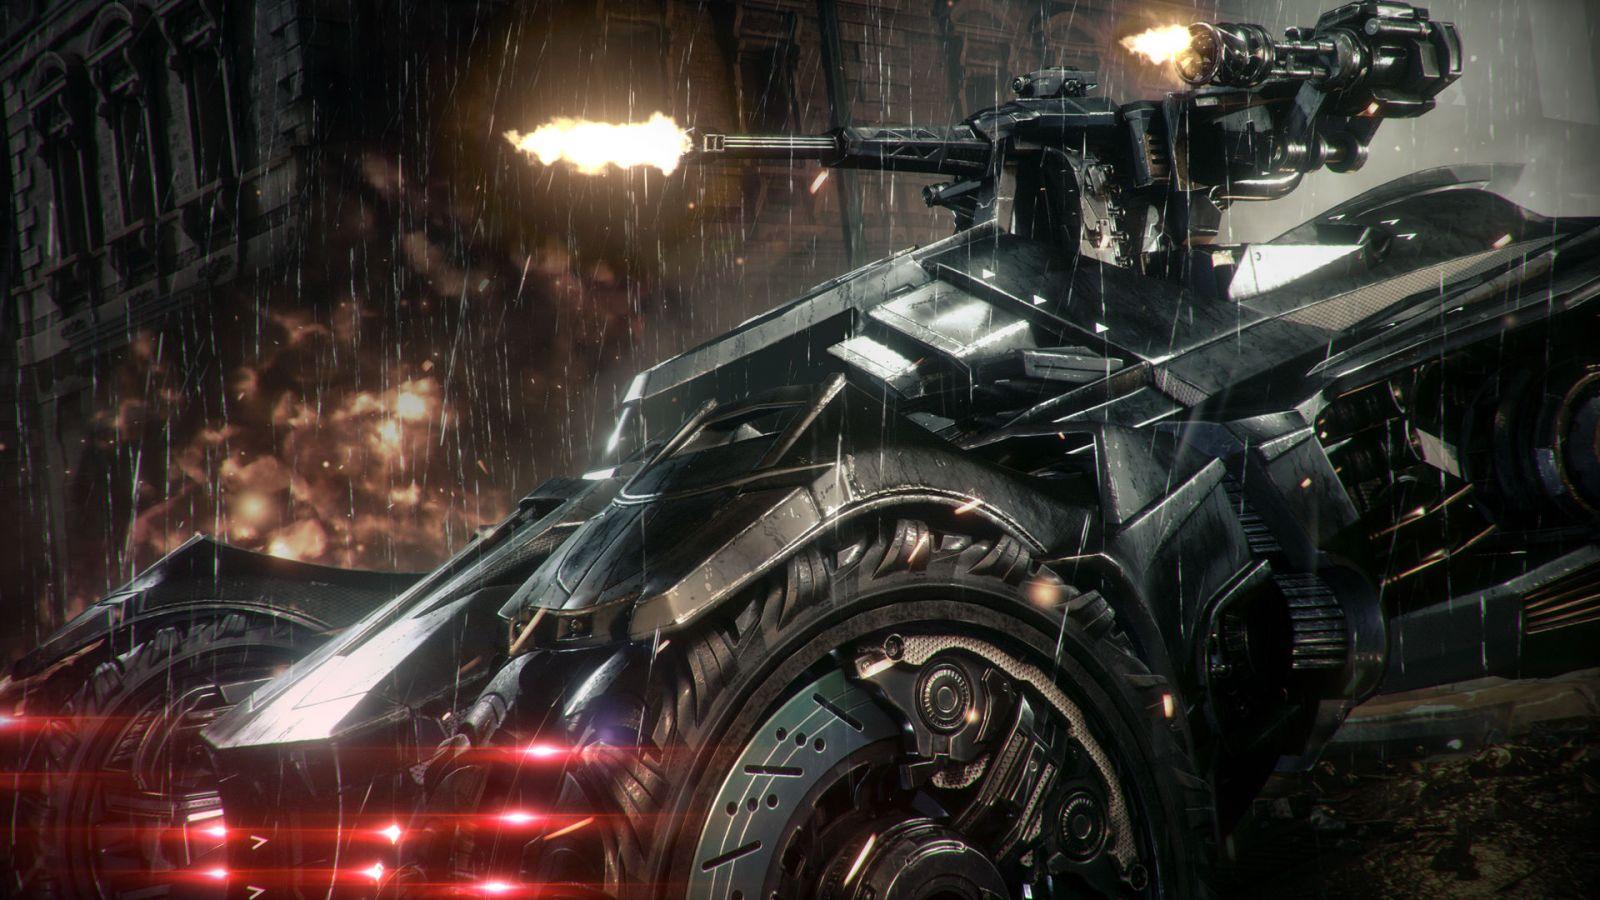 batman-arkham-knight-e3-screen-5.0